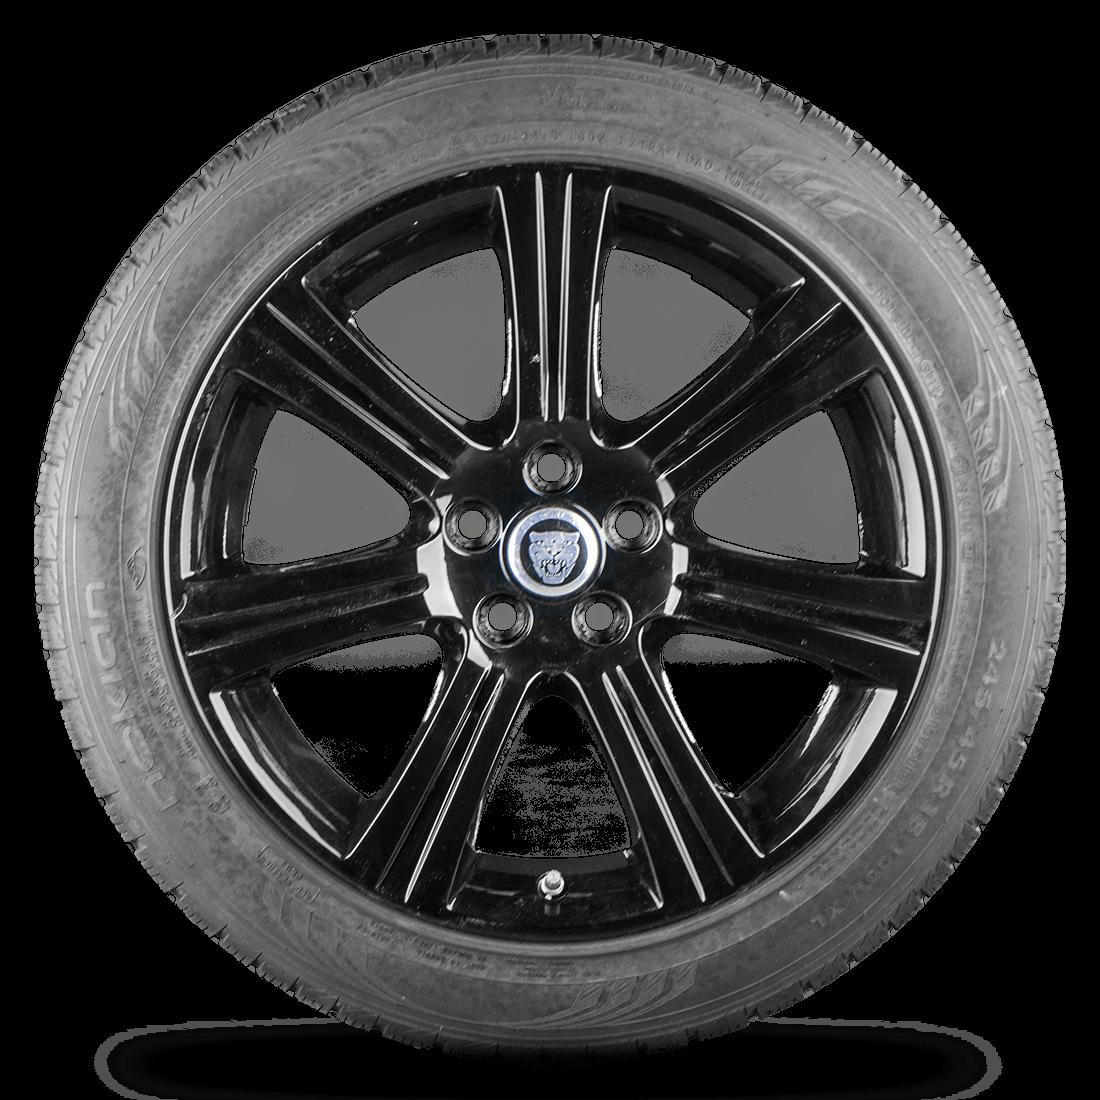 Jaguar XF Sportbrake CC9 18 Zoll Alufelgen Felgen Winterreifen Winterräder